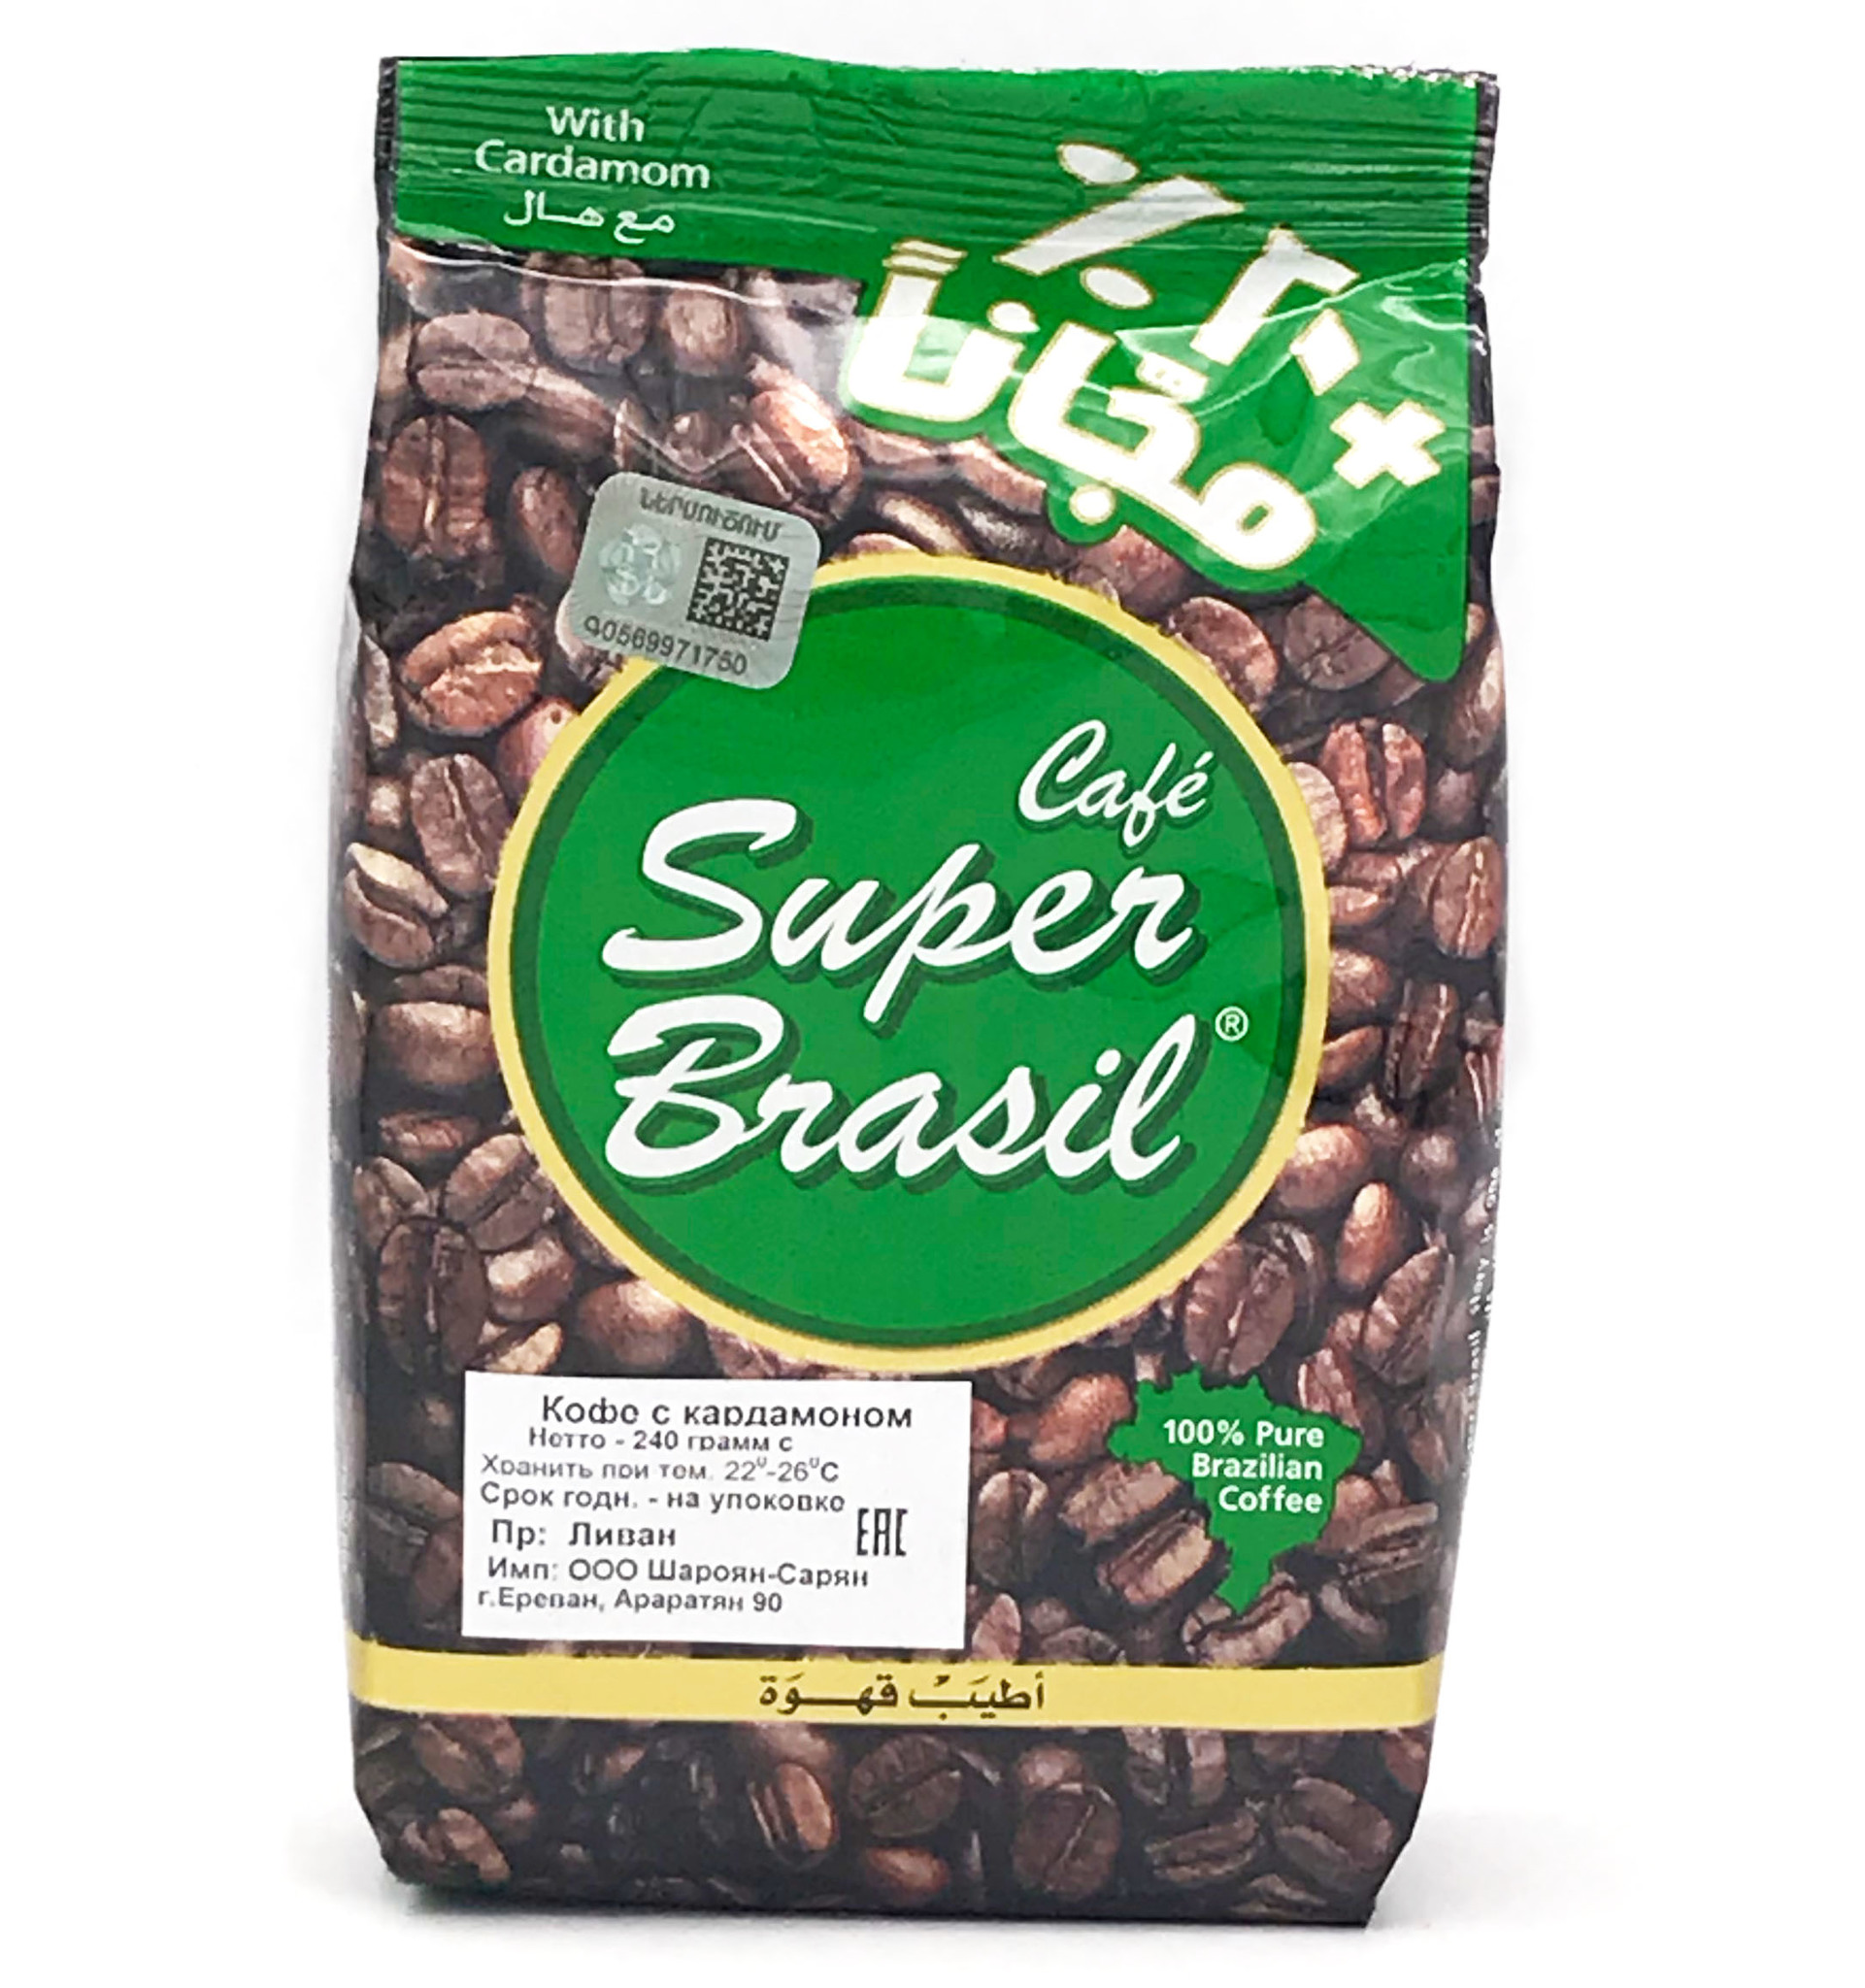 Кофе молотый Арабский кофе молотый с кардамоном, Super Brasil, 240 г import_files_6c_6c80efb1f59b11e9a9ba484d7ecee297_c102ea26f97d11e9a9ba484d7ecee297.jpg